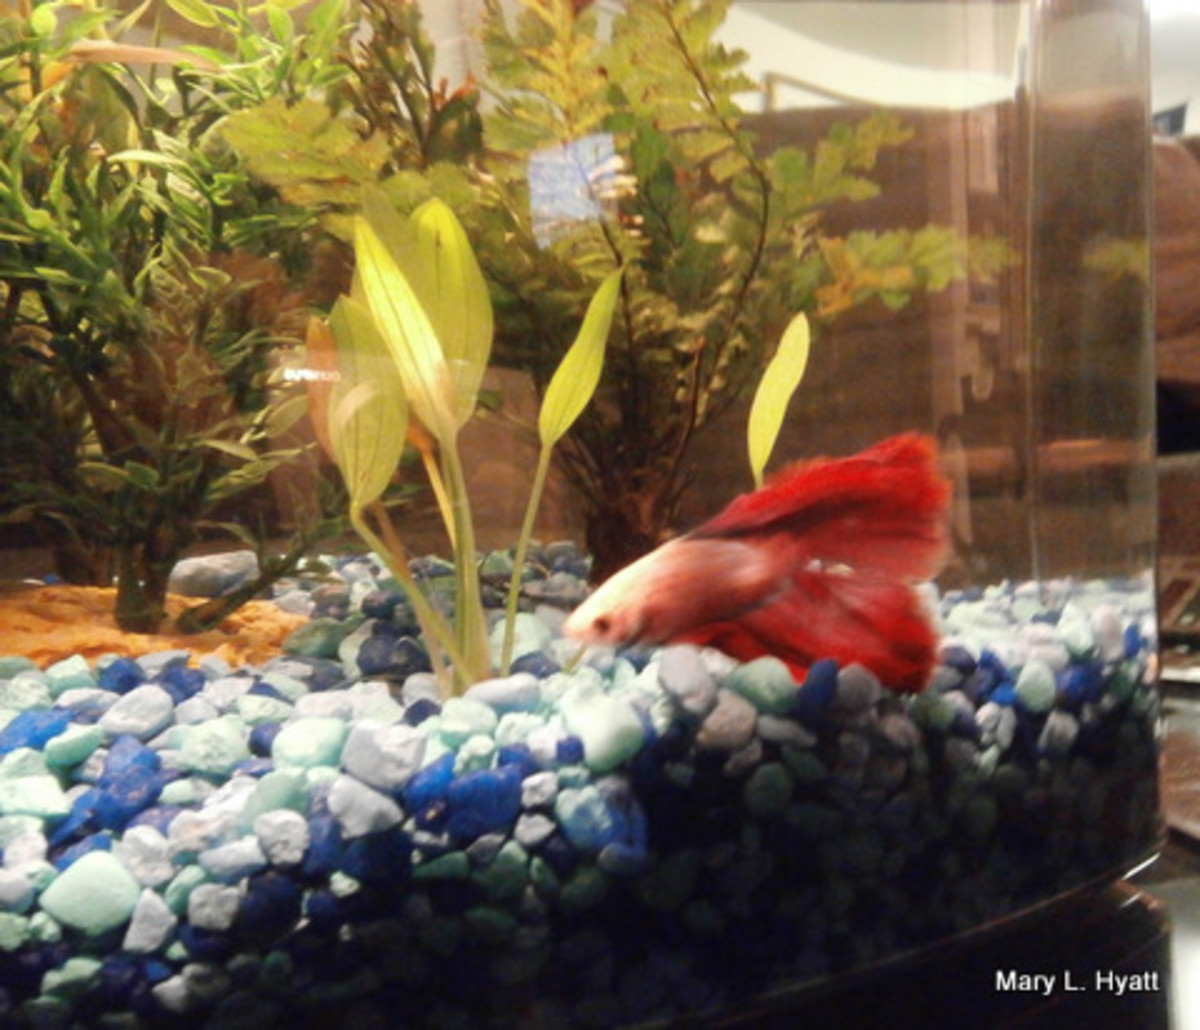 the-aquafarm-hydroponic-system-i-have-for-my-betta-fish